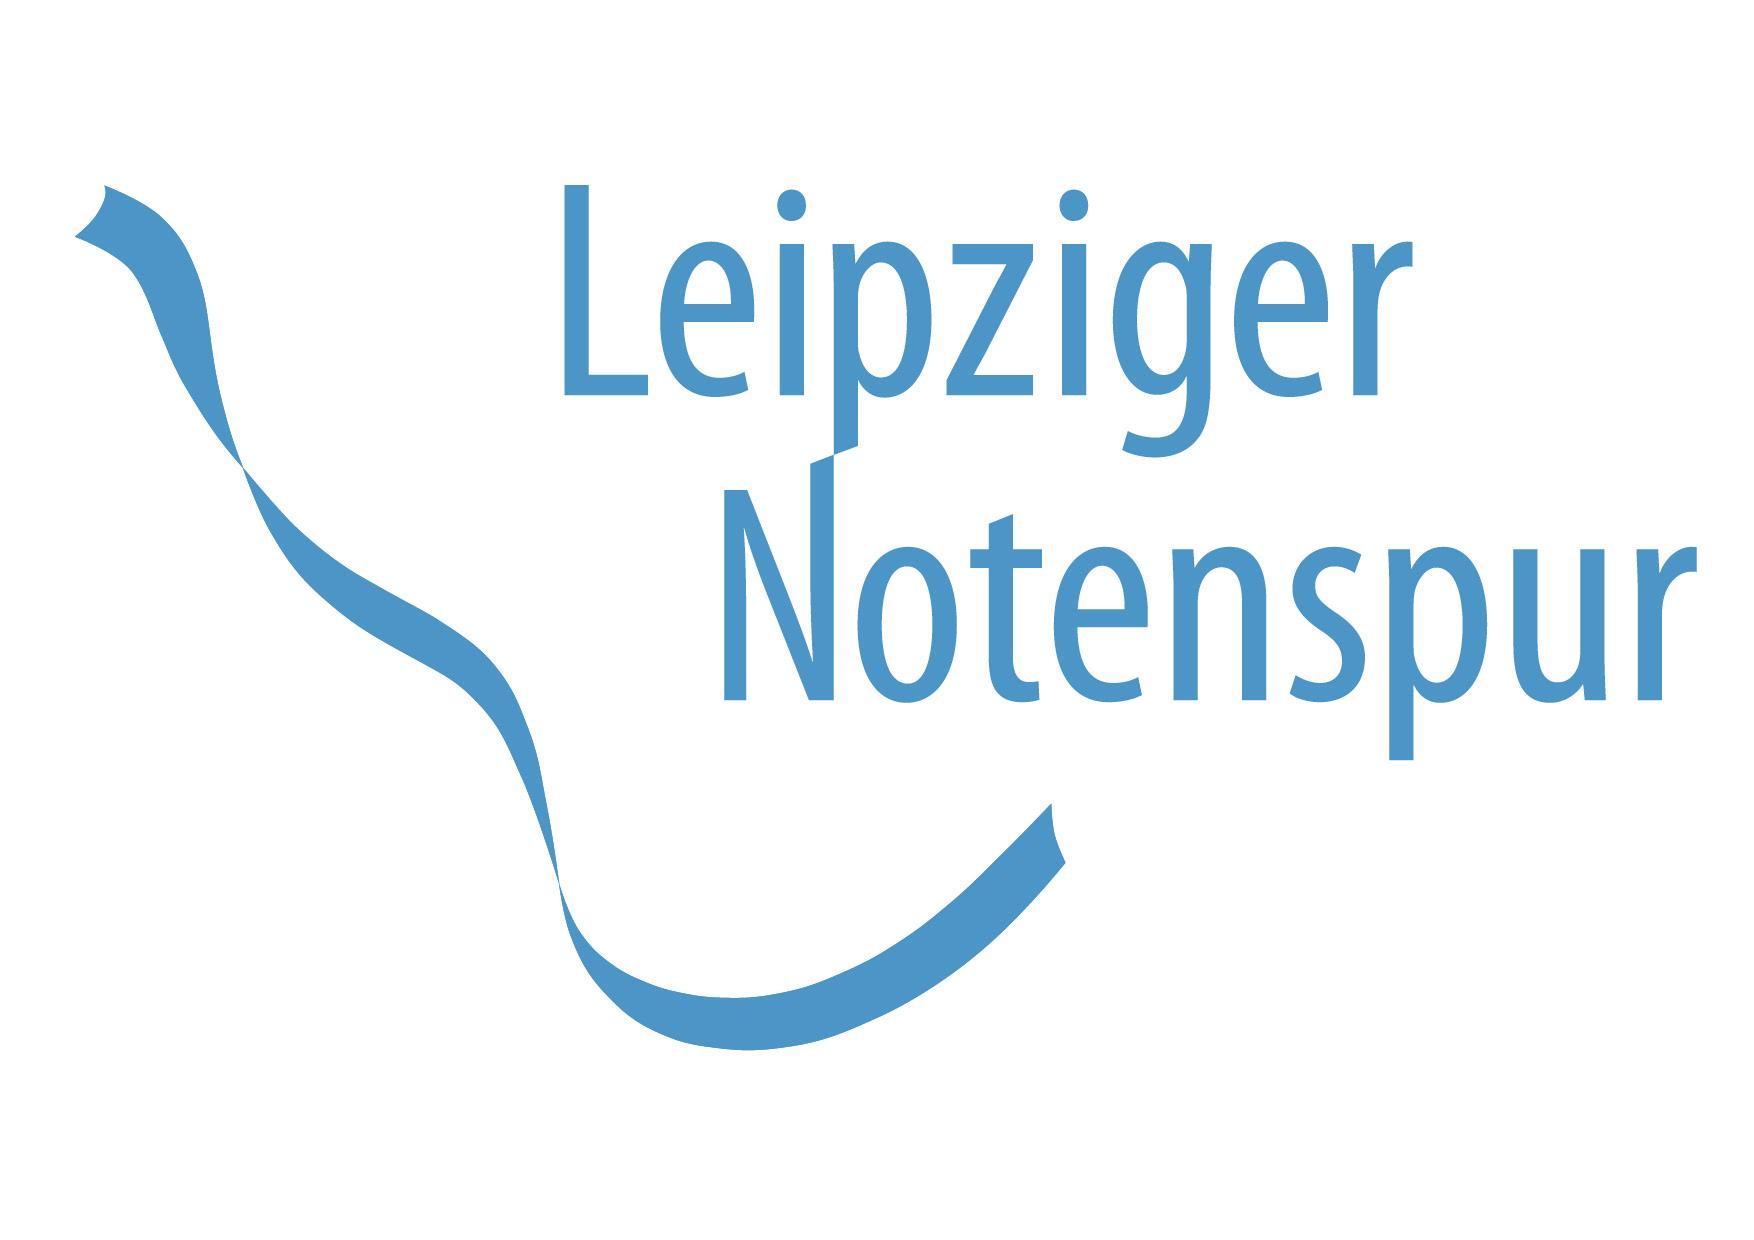 Leipziger Notenspur